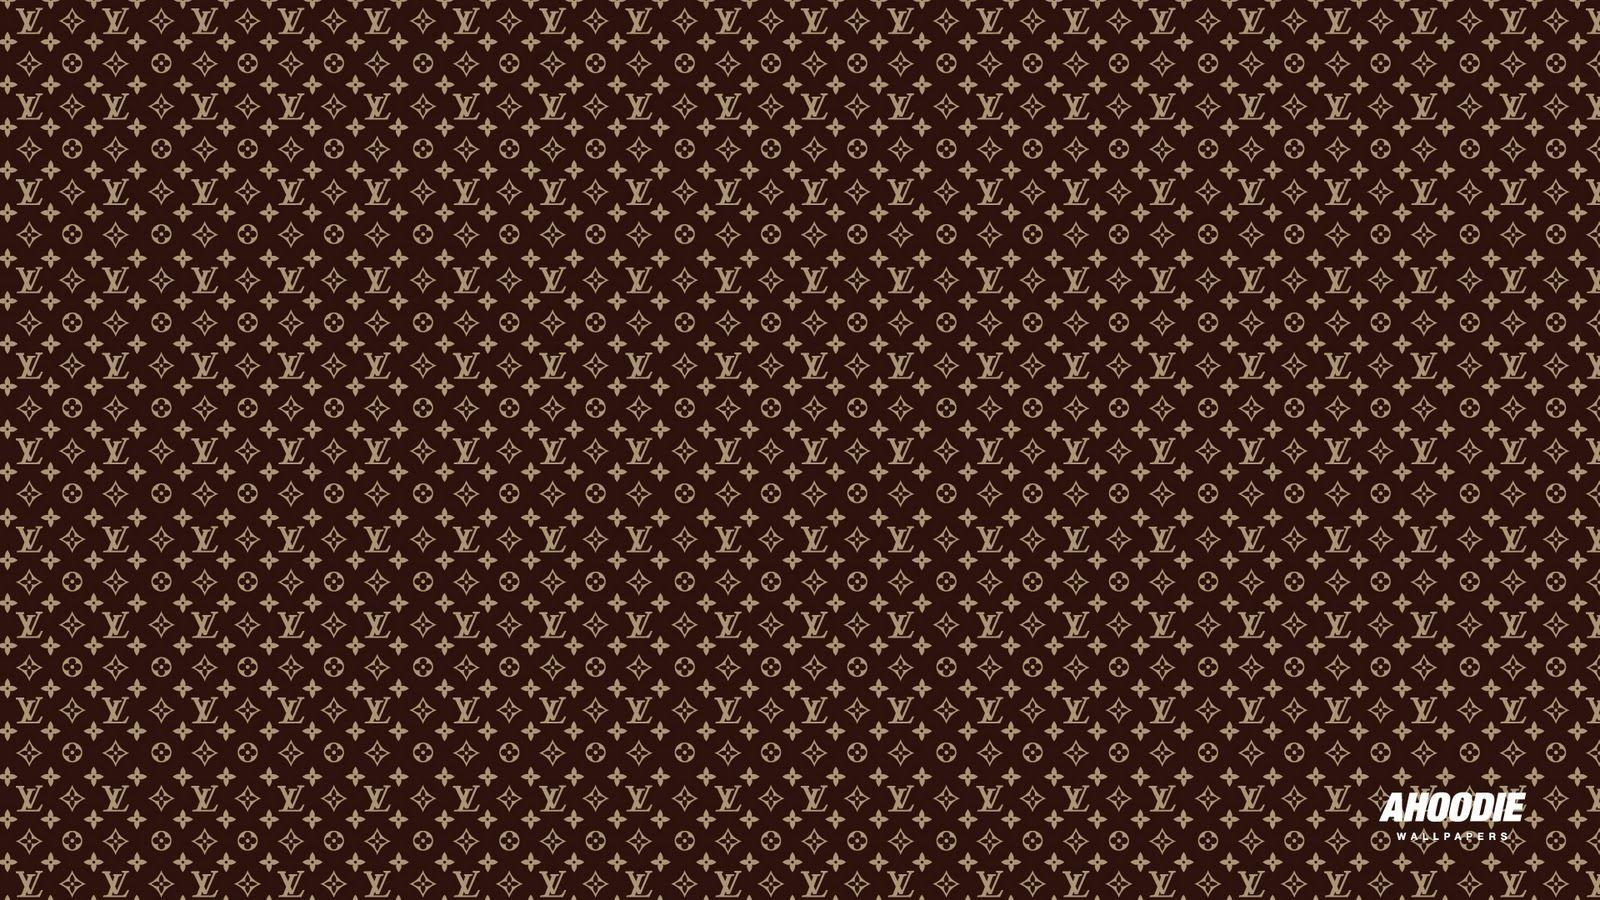 Louis vuitton wallpaper wallpapers full hd louis vuitton full hd louis vuitton wallpaper wallpapers full hd louis vuitton full hd desktop wallpapers voltagebd Gallery